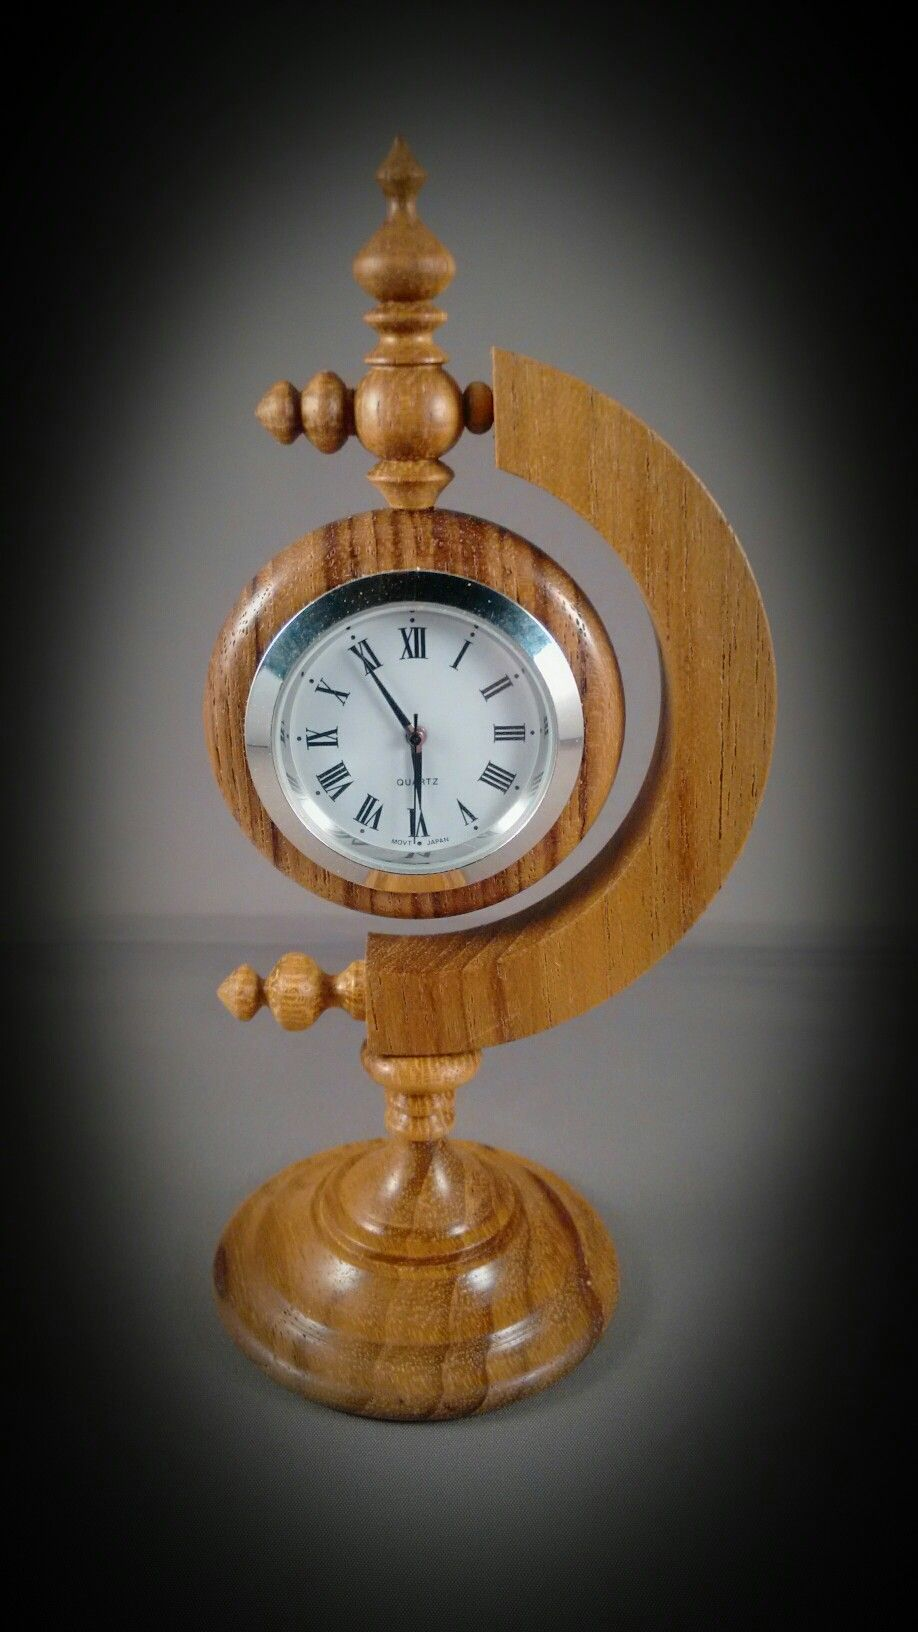 Pin by W wjl on Shop ideals Wood turning, Wood clocks